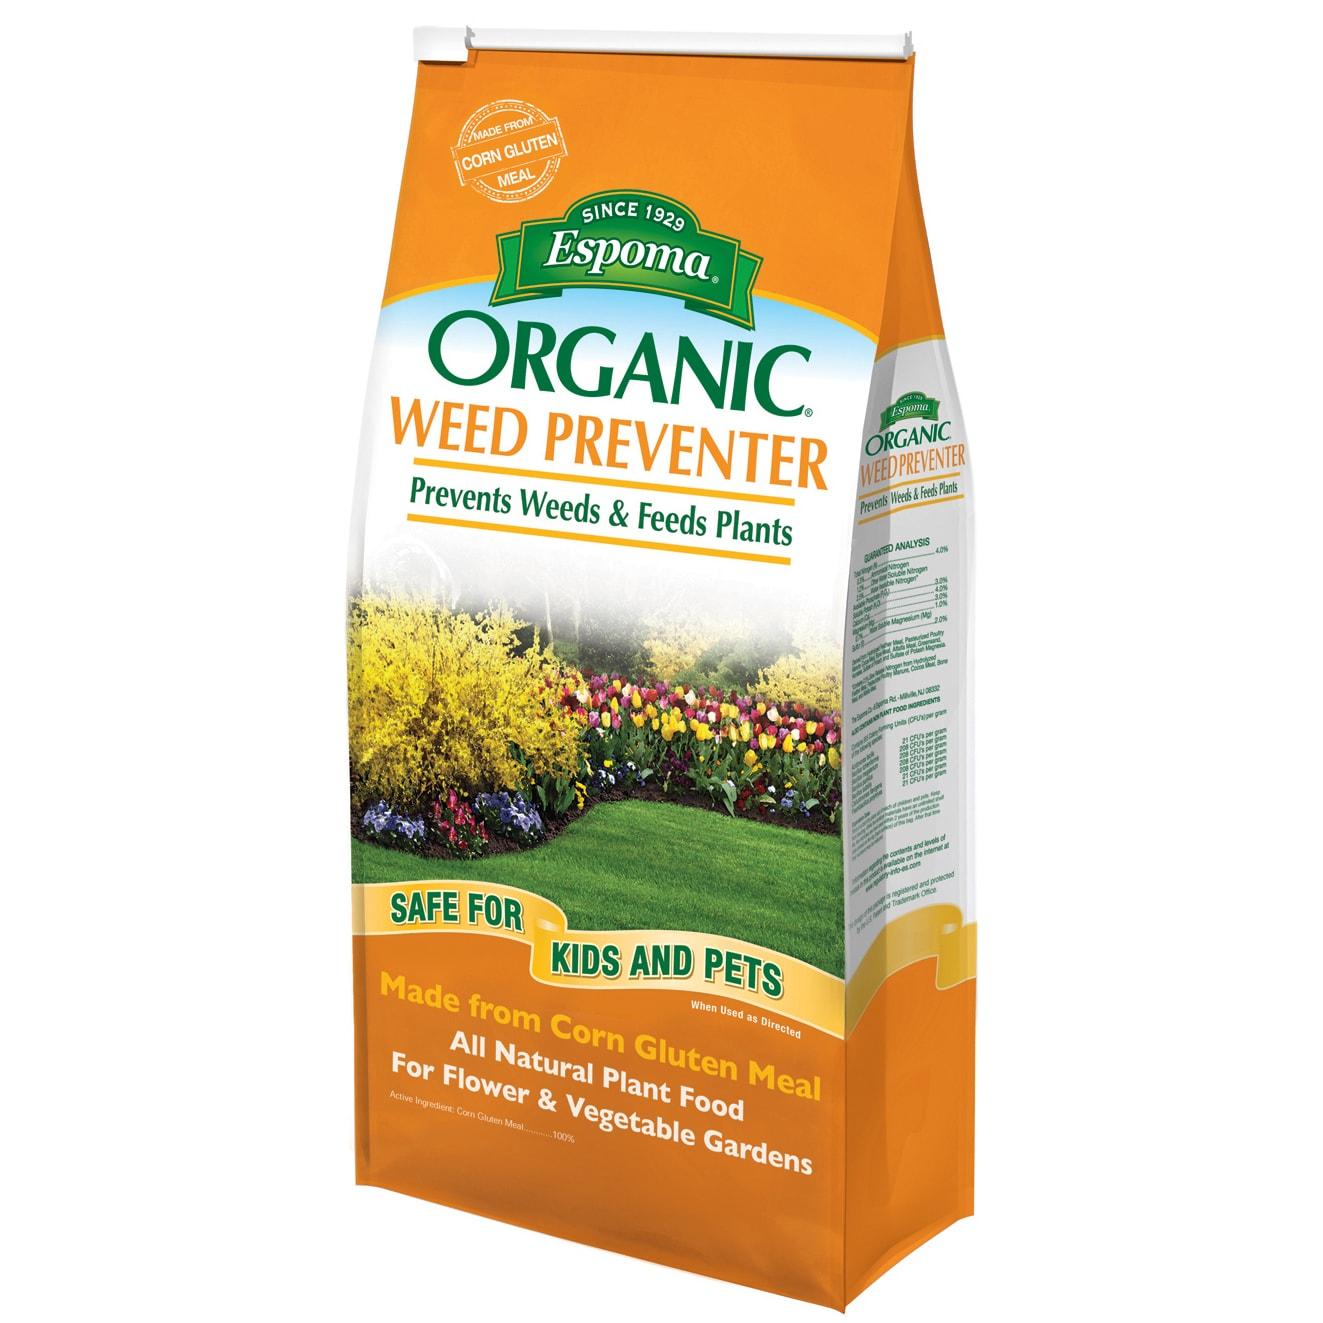 ESPOMA CGP6 Organic Weed Preventer Plus Plant Food (Plant...